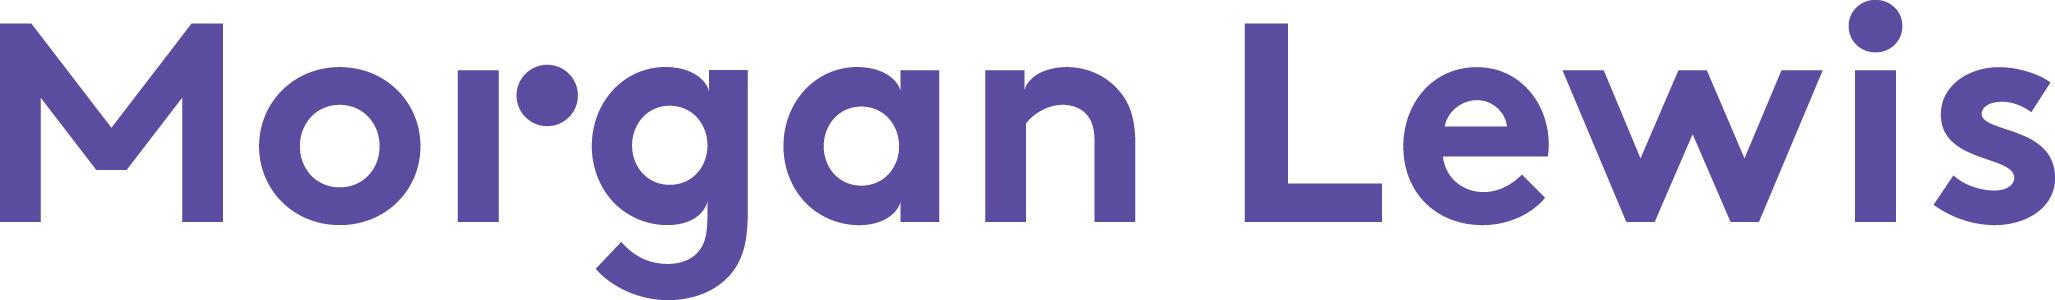 Morgan Lewis Logo in purple